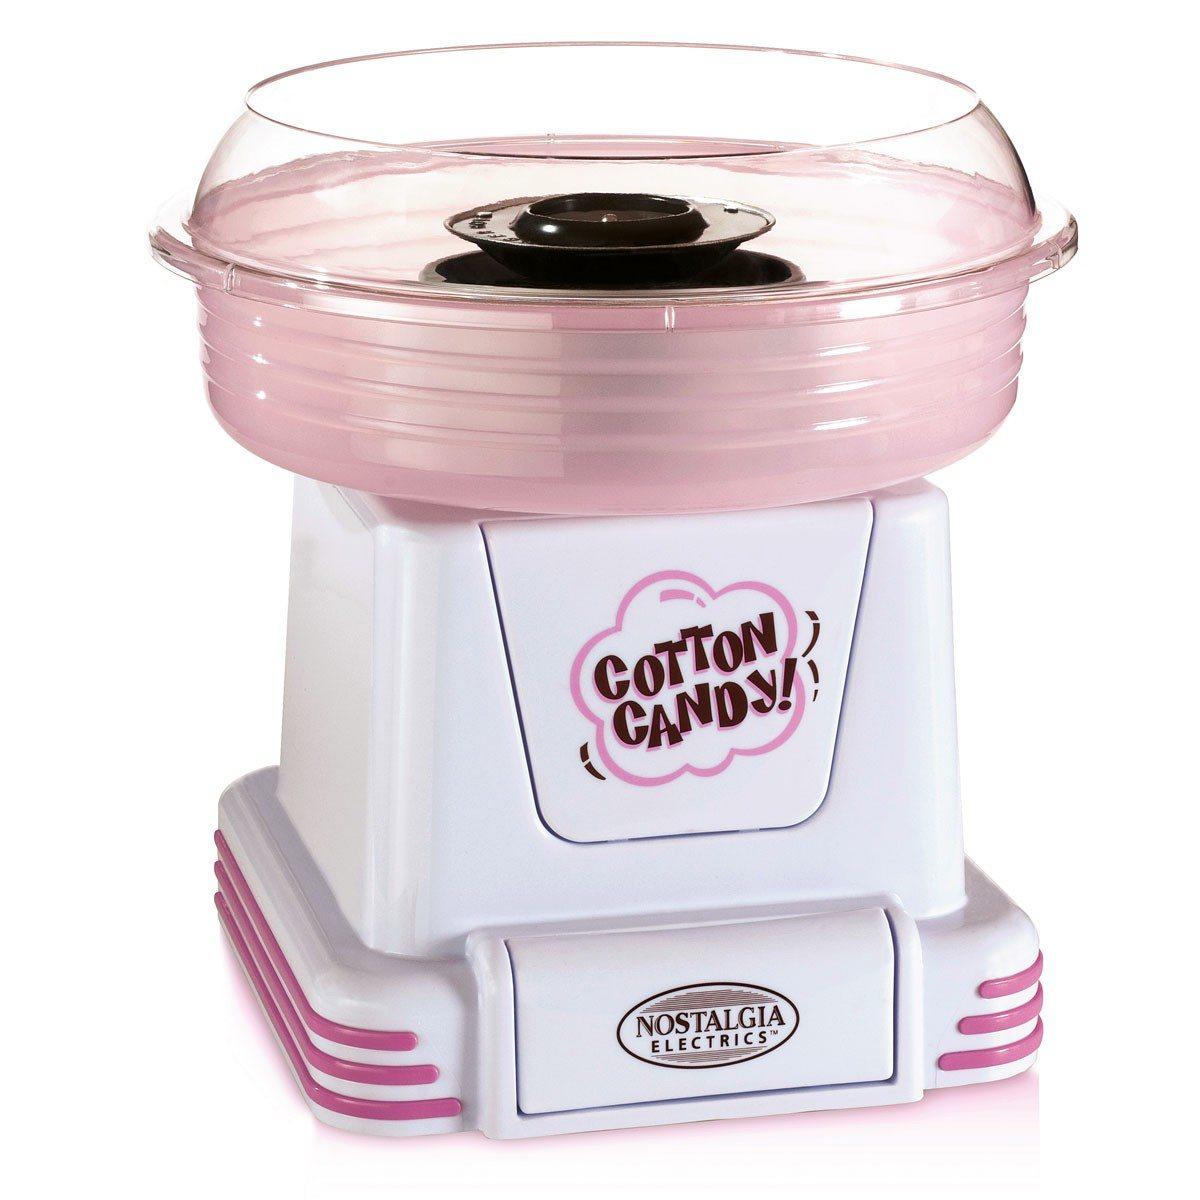 Candyflossmaskine